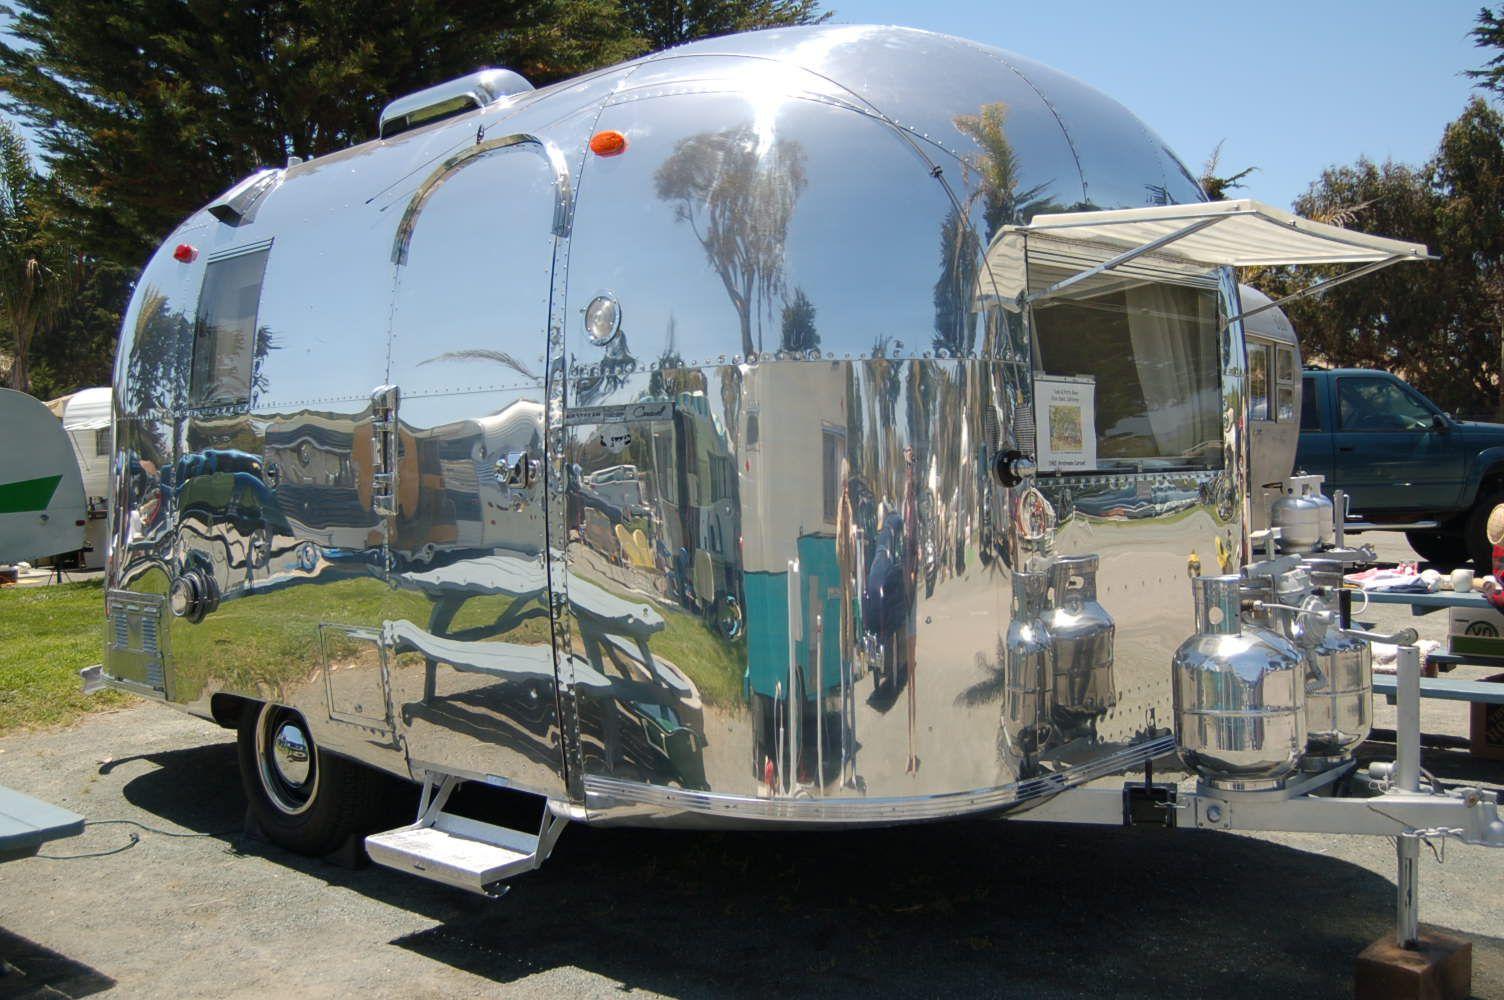 vintage trailers imagaes 1967 airstream caravel travel. Black Bedroom Furniture Sets. Home Design Ideas